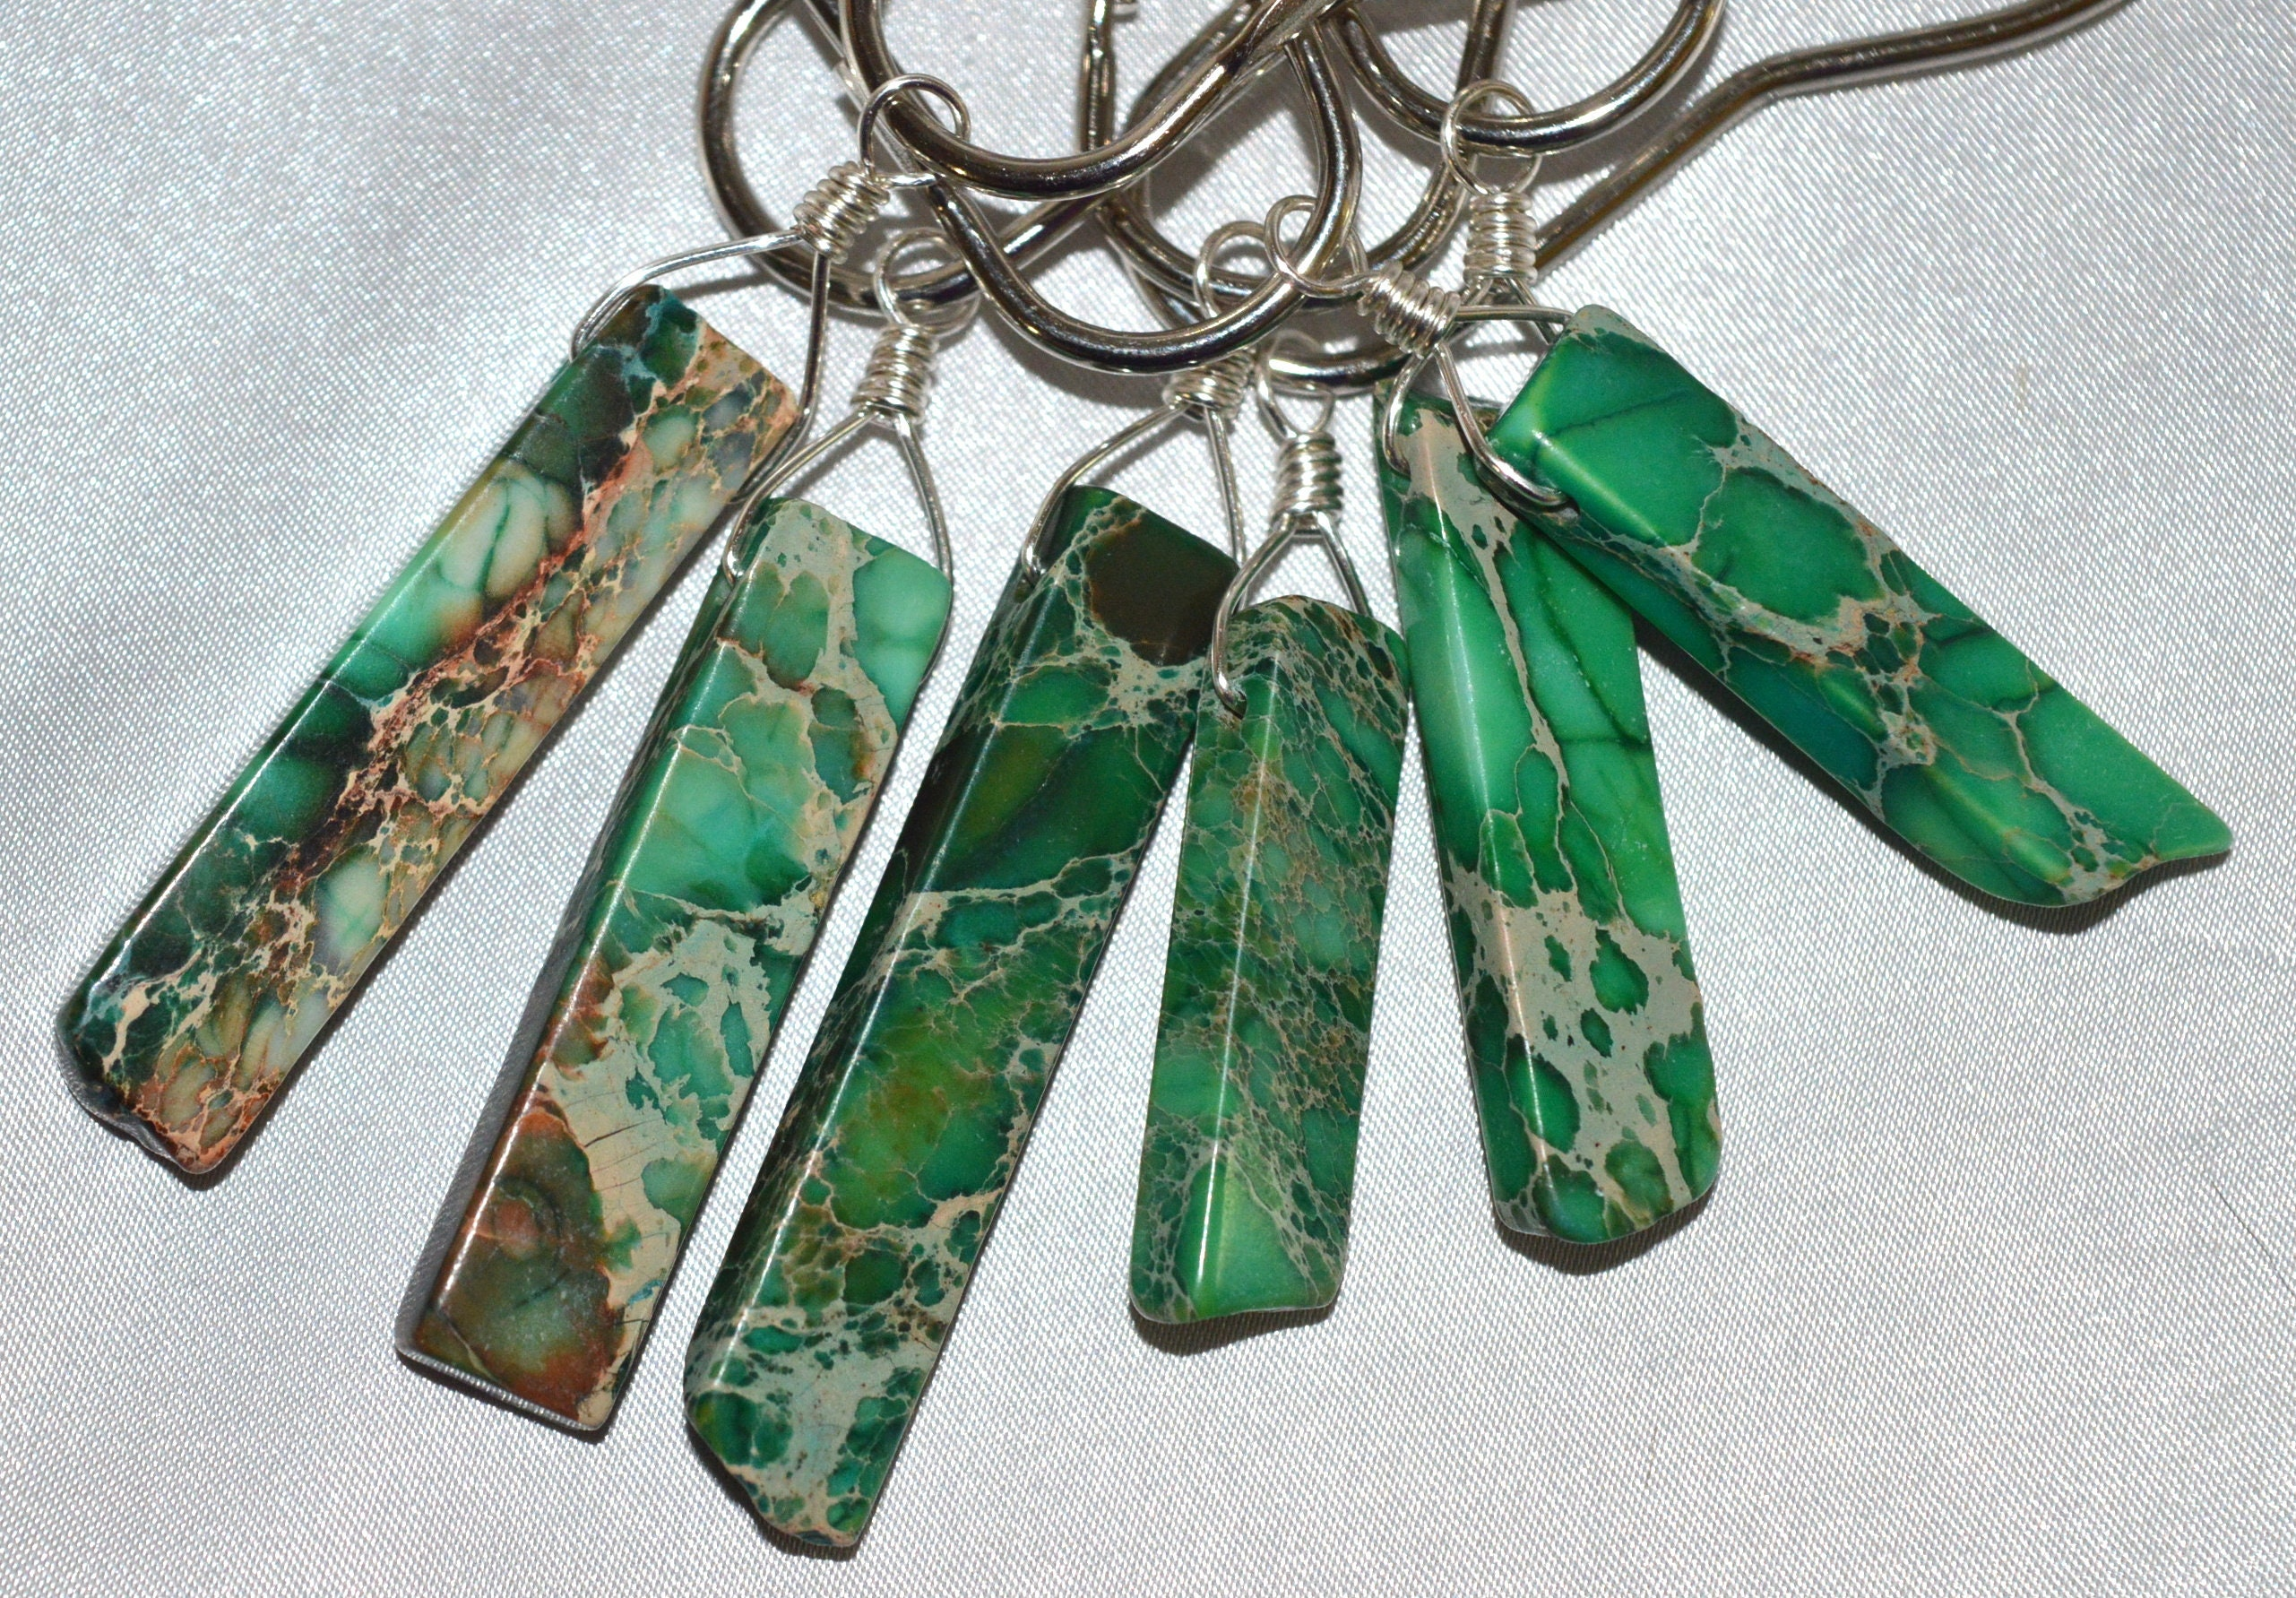 Green Imperial Jasper Shower Curtain Hooks Set Of 12 Silver Wire Wrapped Bale Genuine Stone Regalite Sea Sediment Jasper Christmas